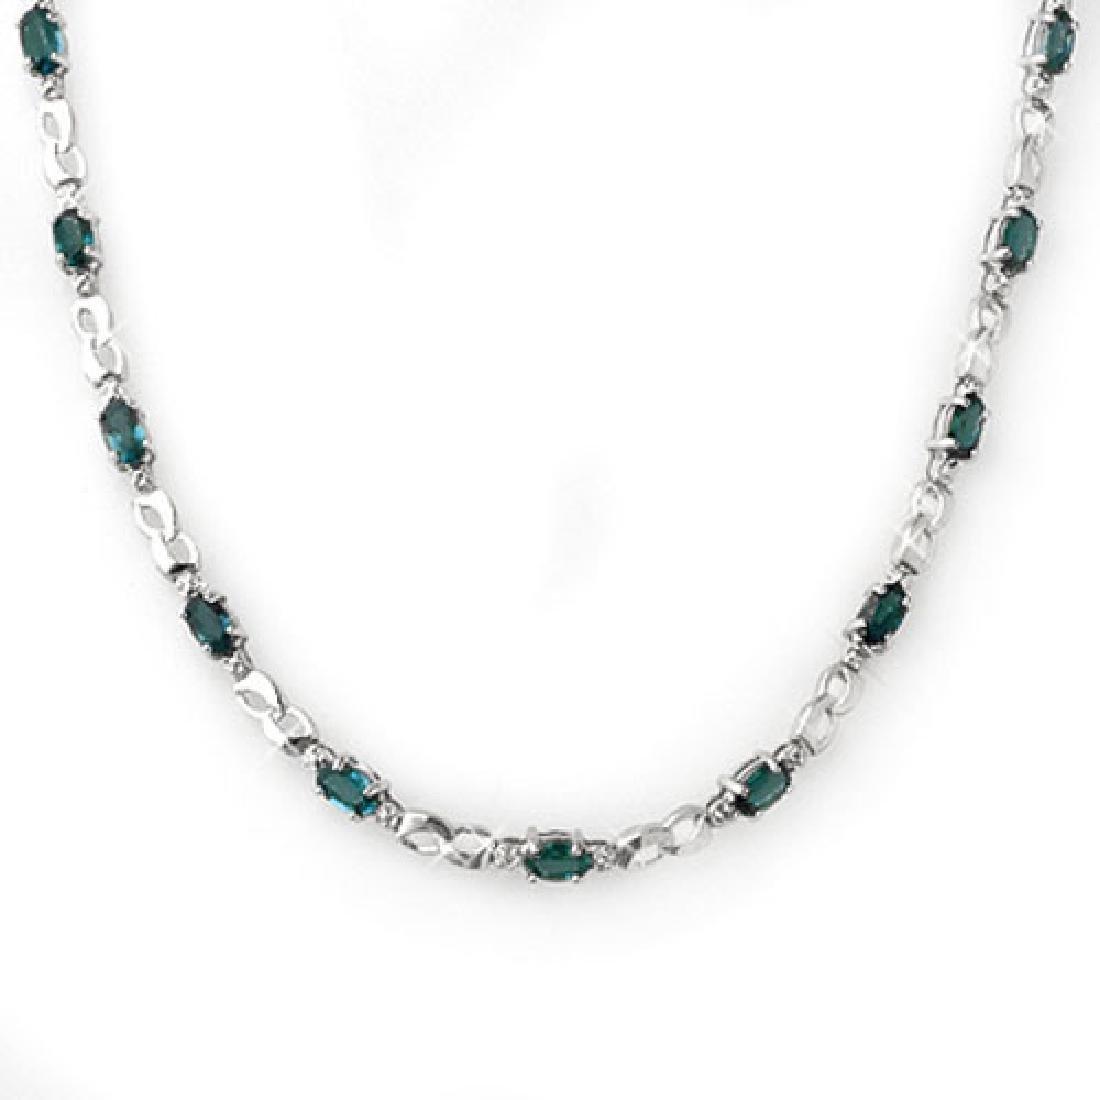 9.02 CTW Blue Sapphire & Diamond Necklace 18K White